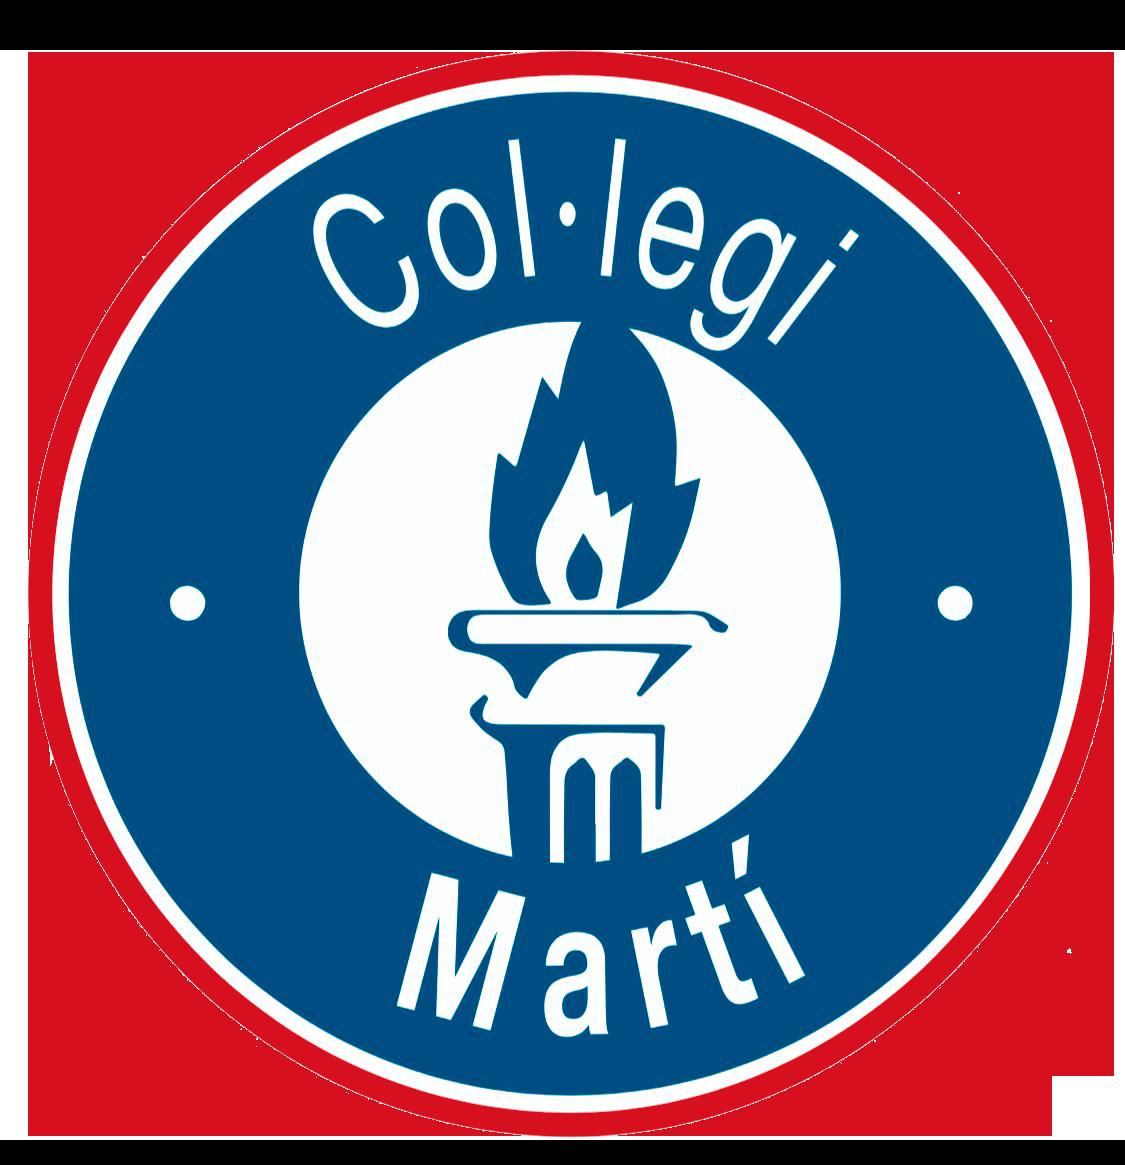 2018.04.06 Logo cole mida gran